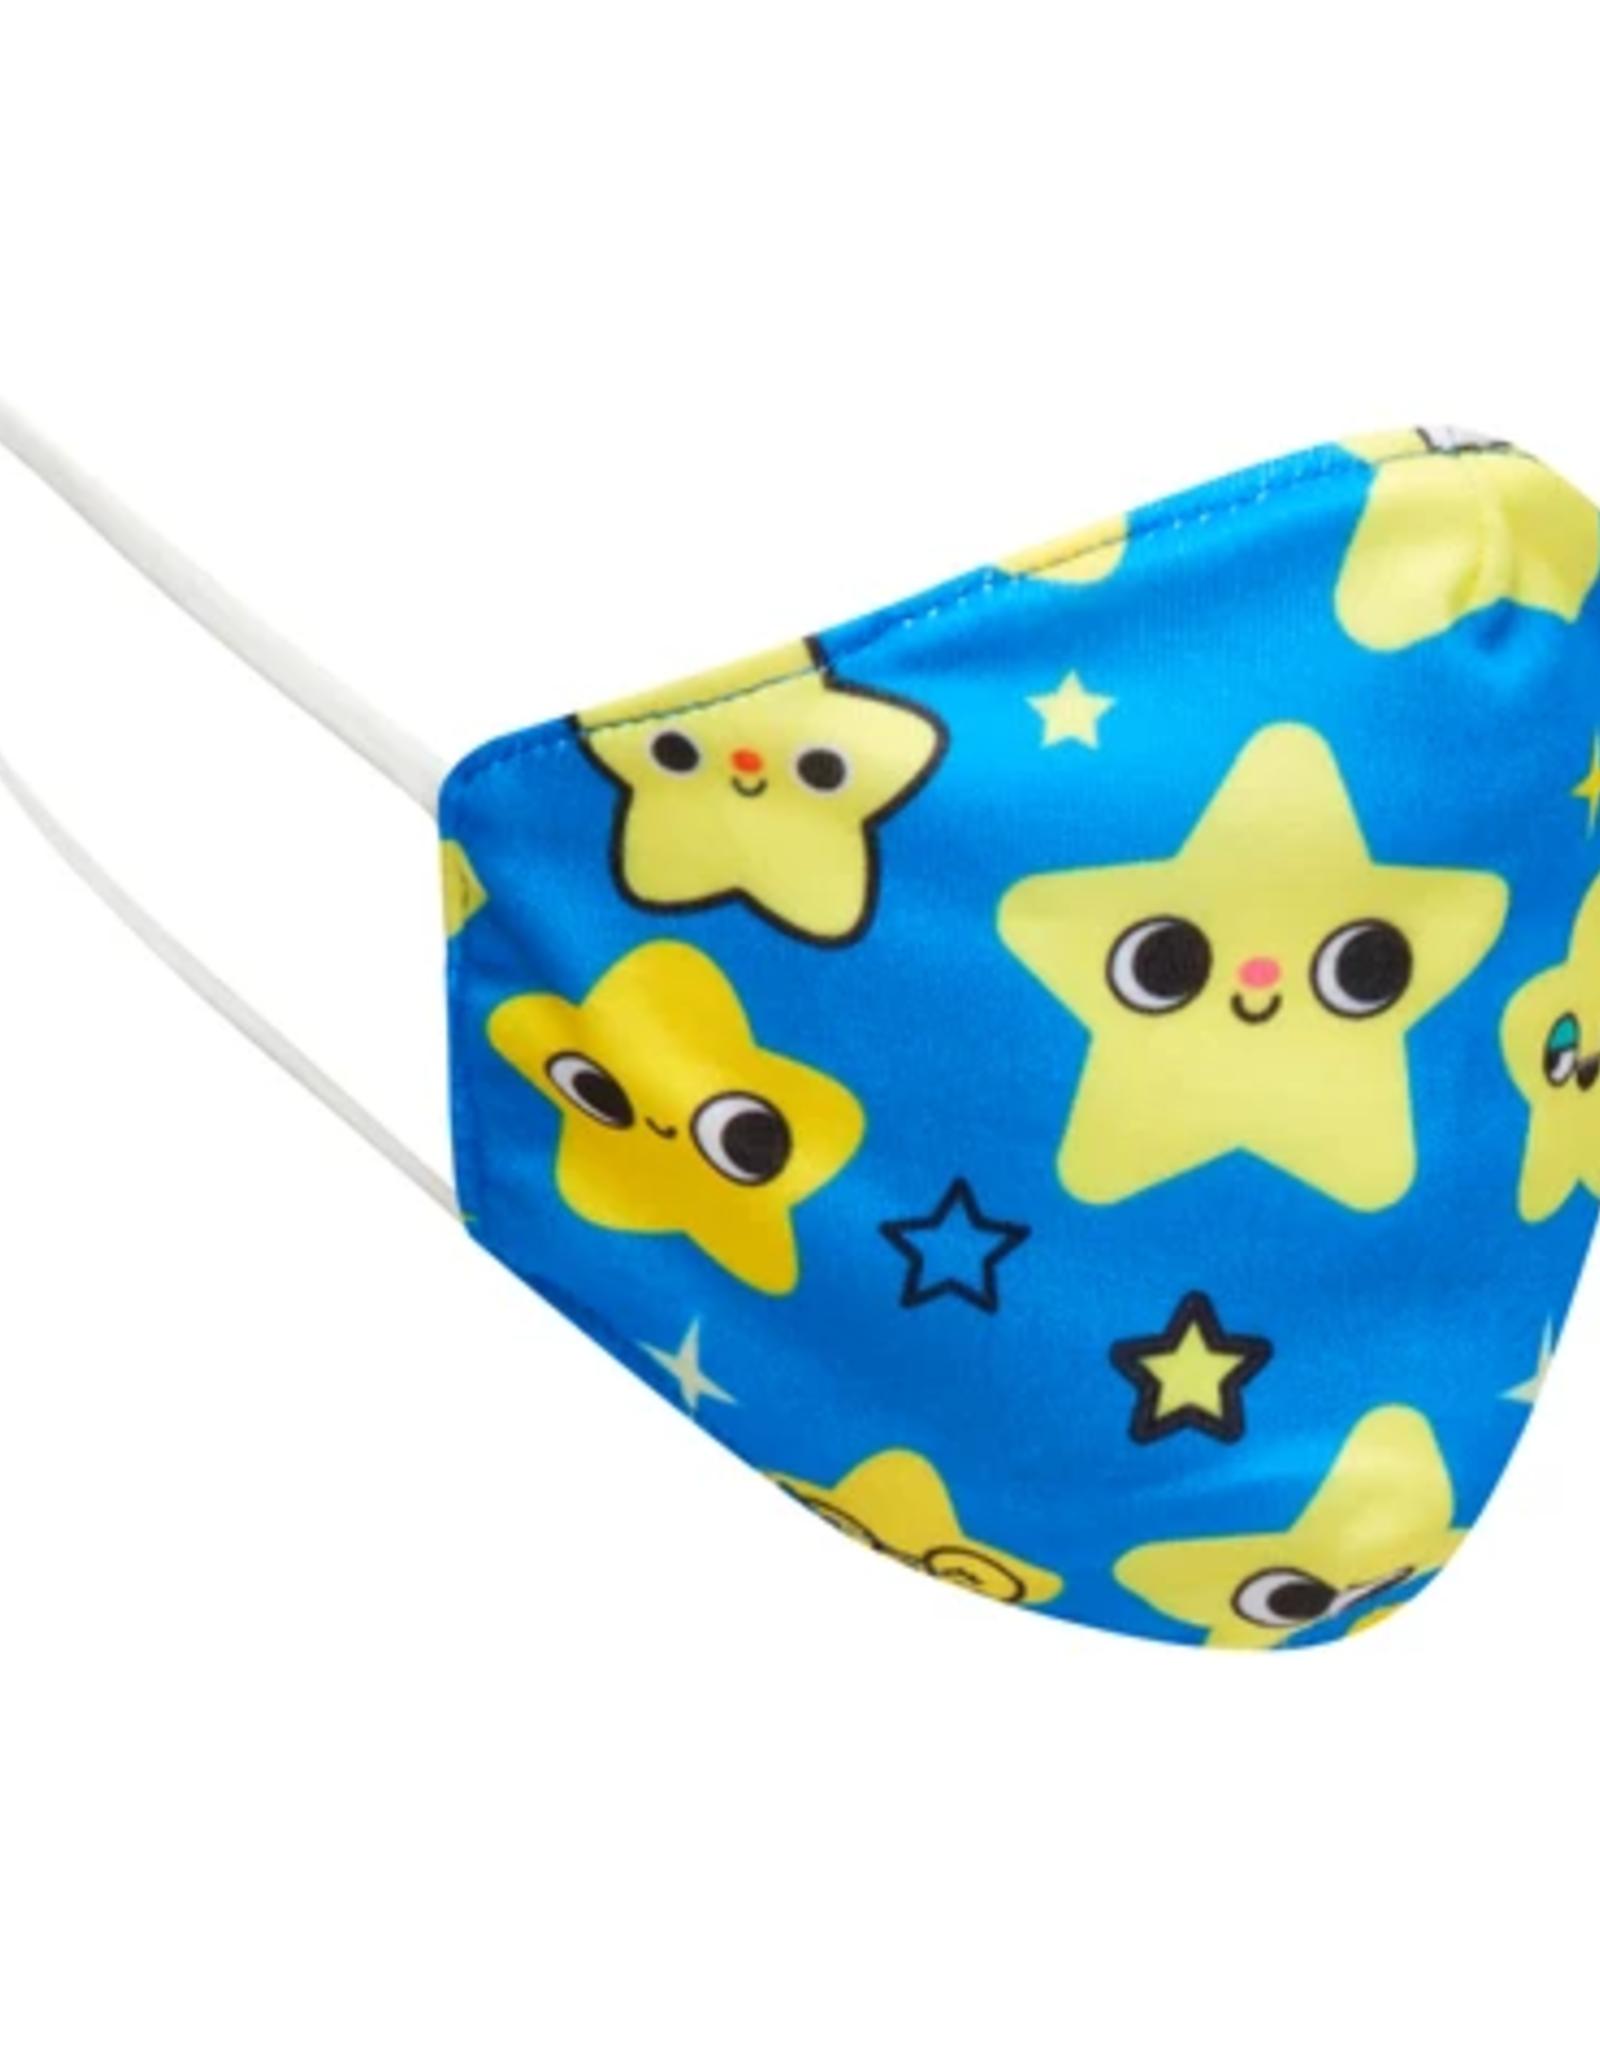 PANGO PRODUCTIONS FACE MASK KIDS CLOTH STARS